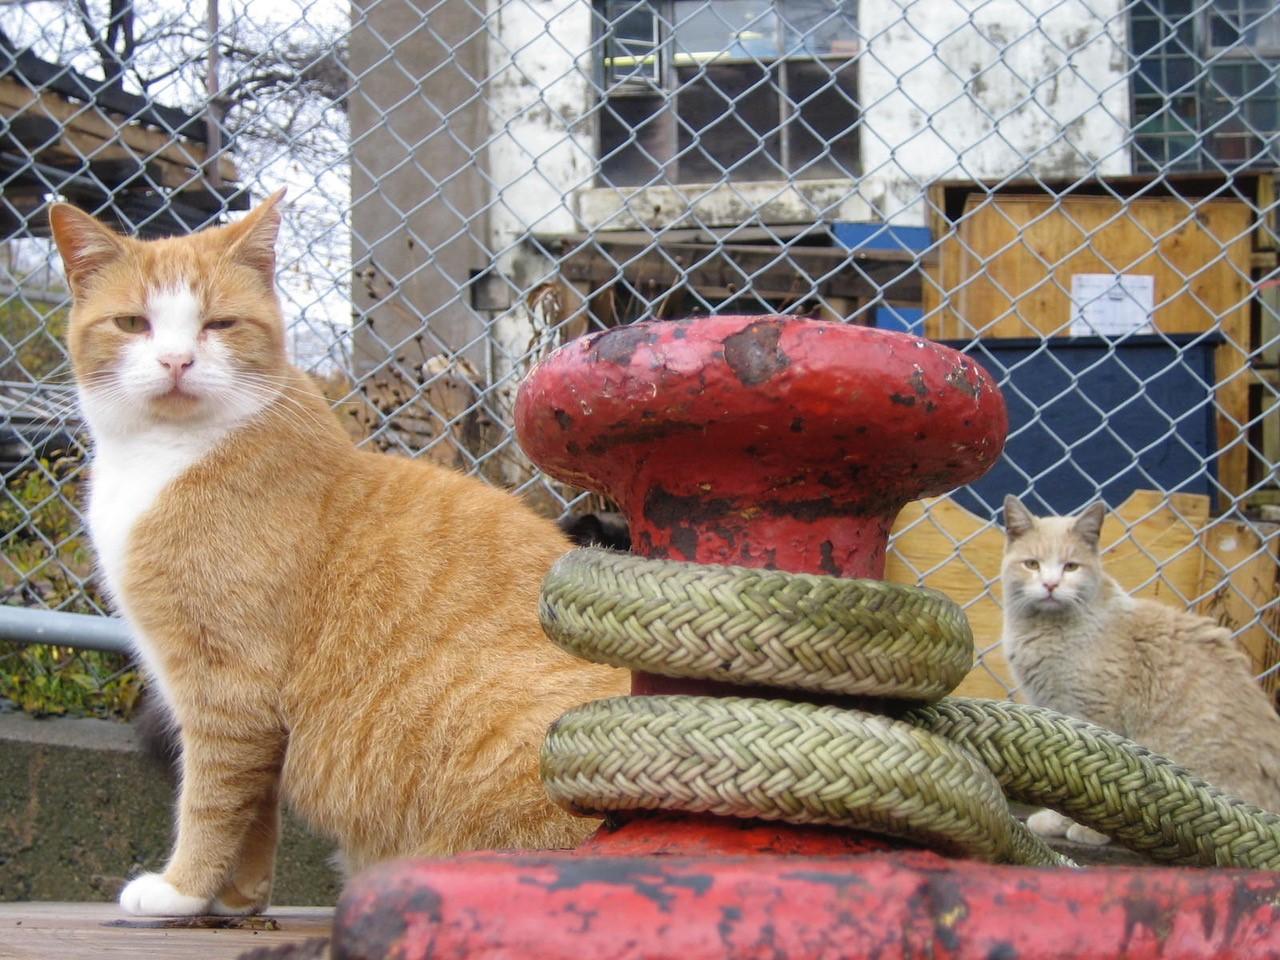 frontpagecats.jpg